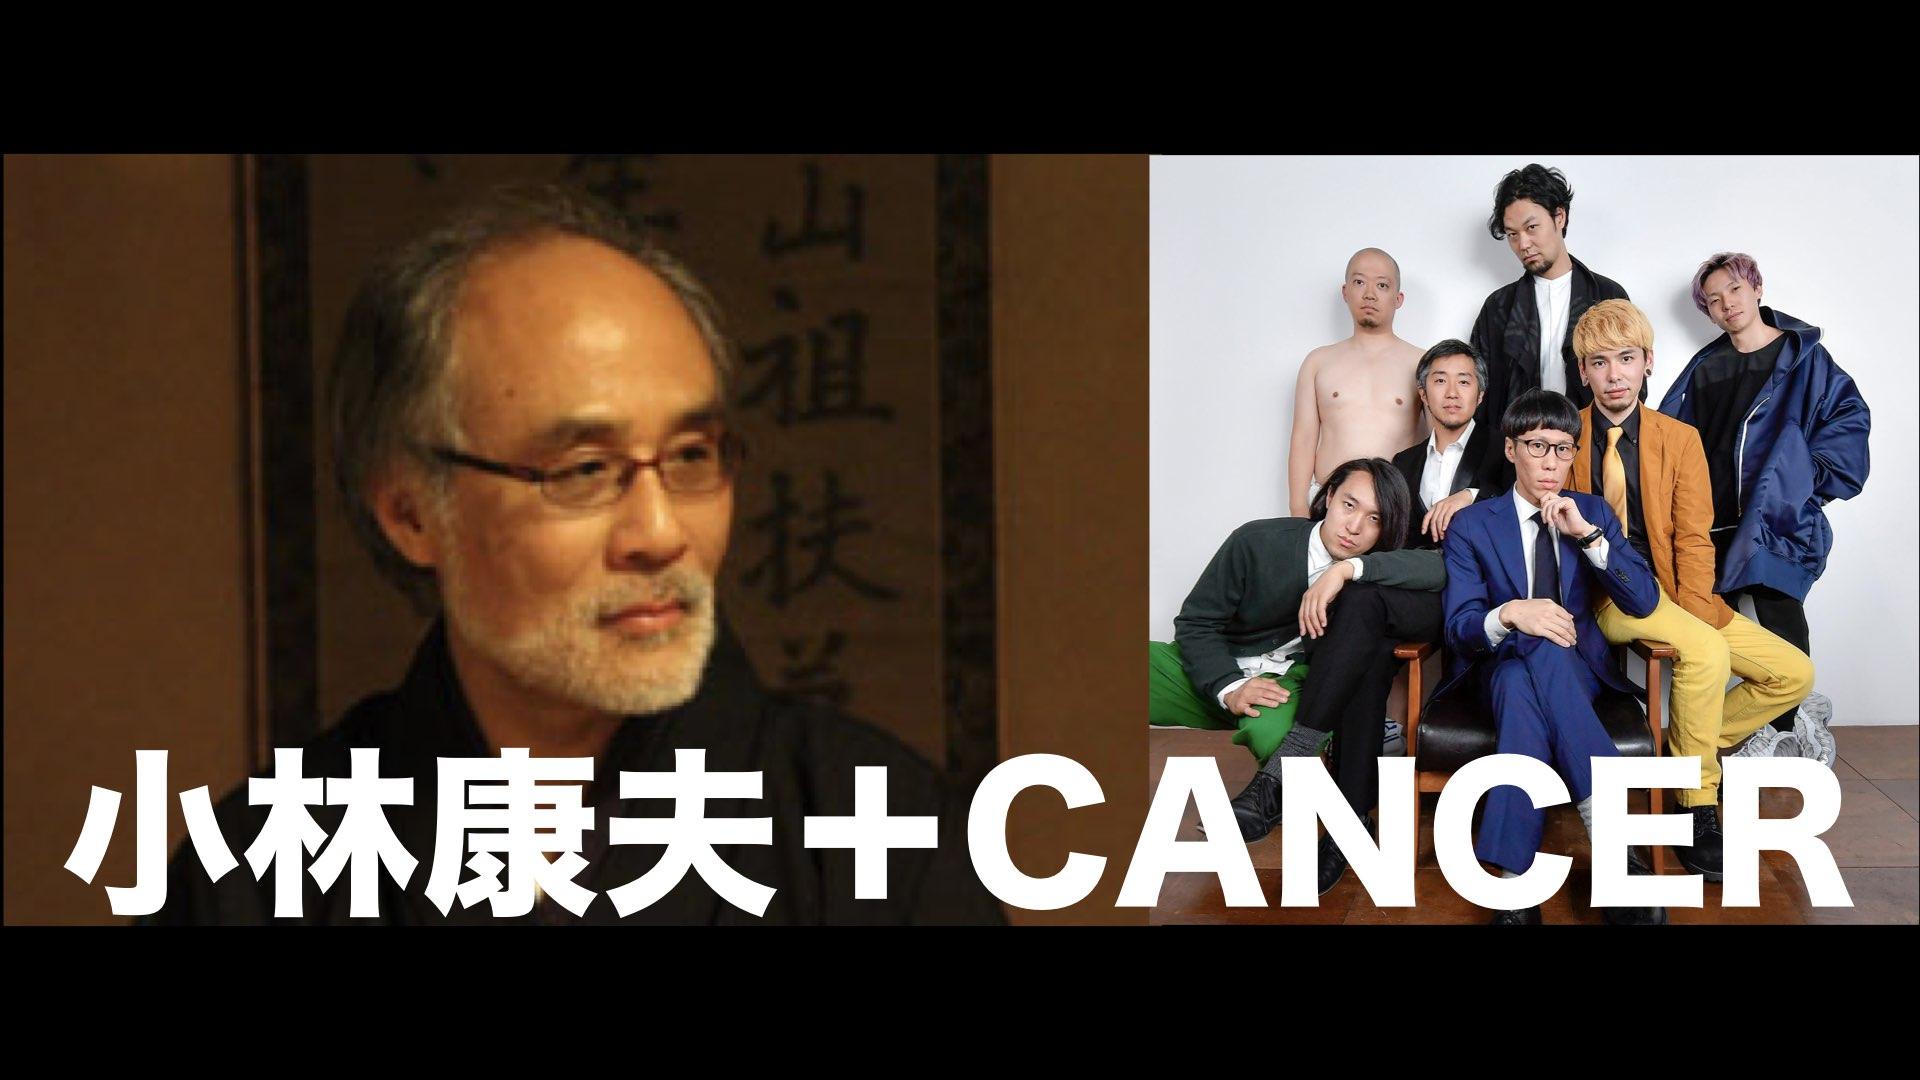 【CANCER】小林康夫+CANCER